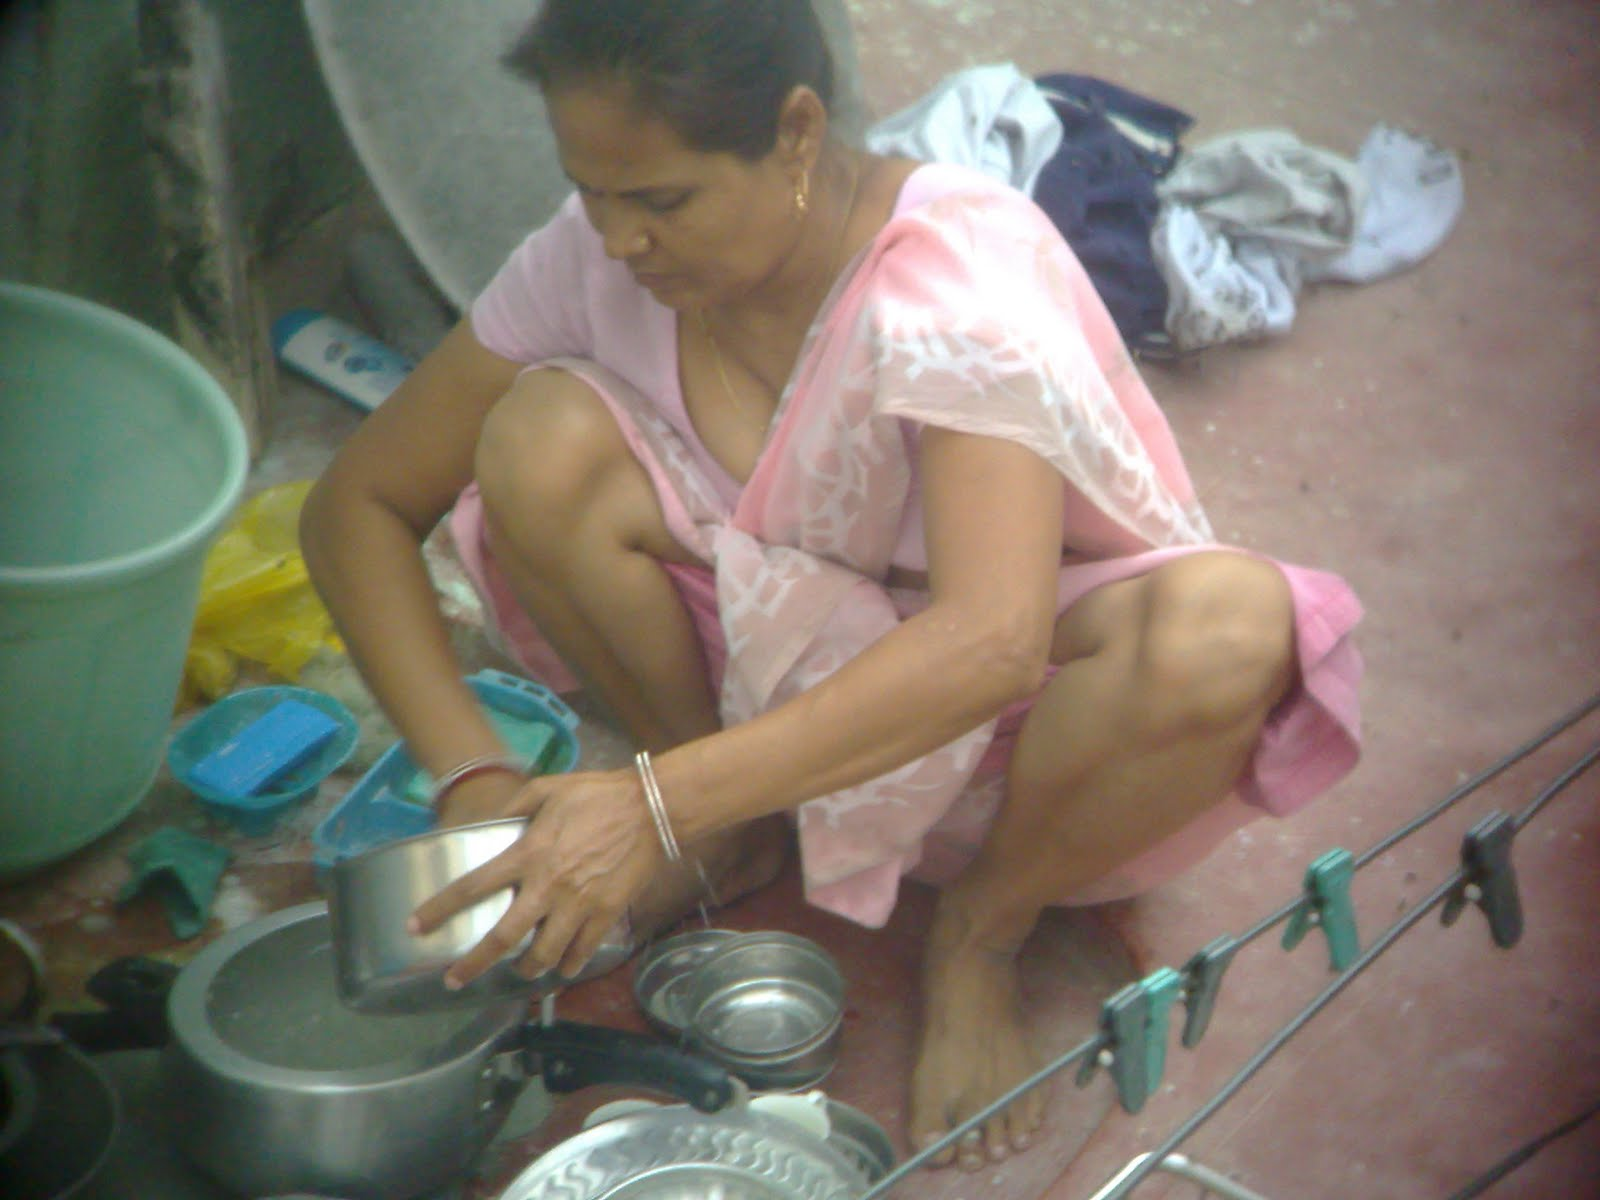 kamwali bai photos submited images